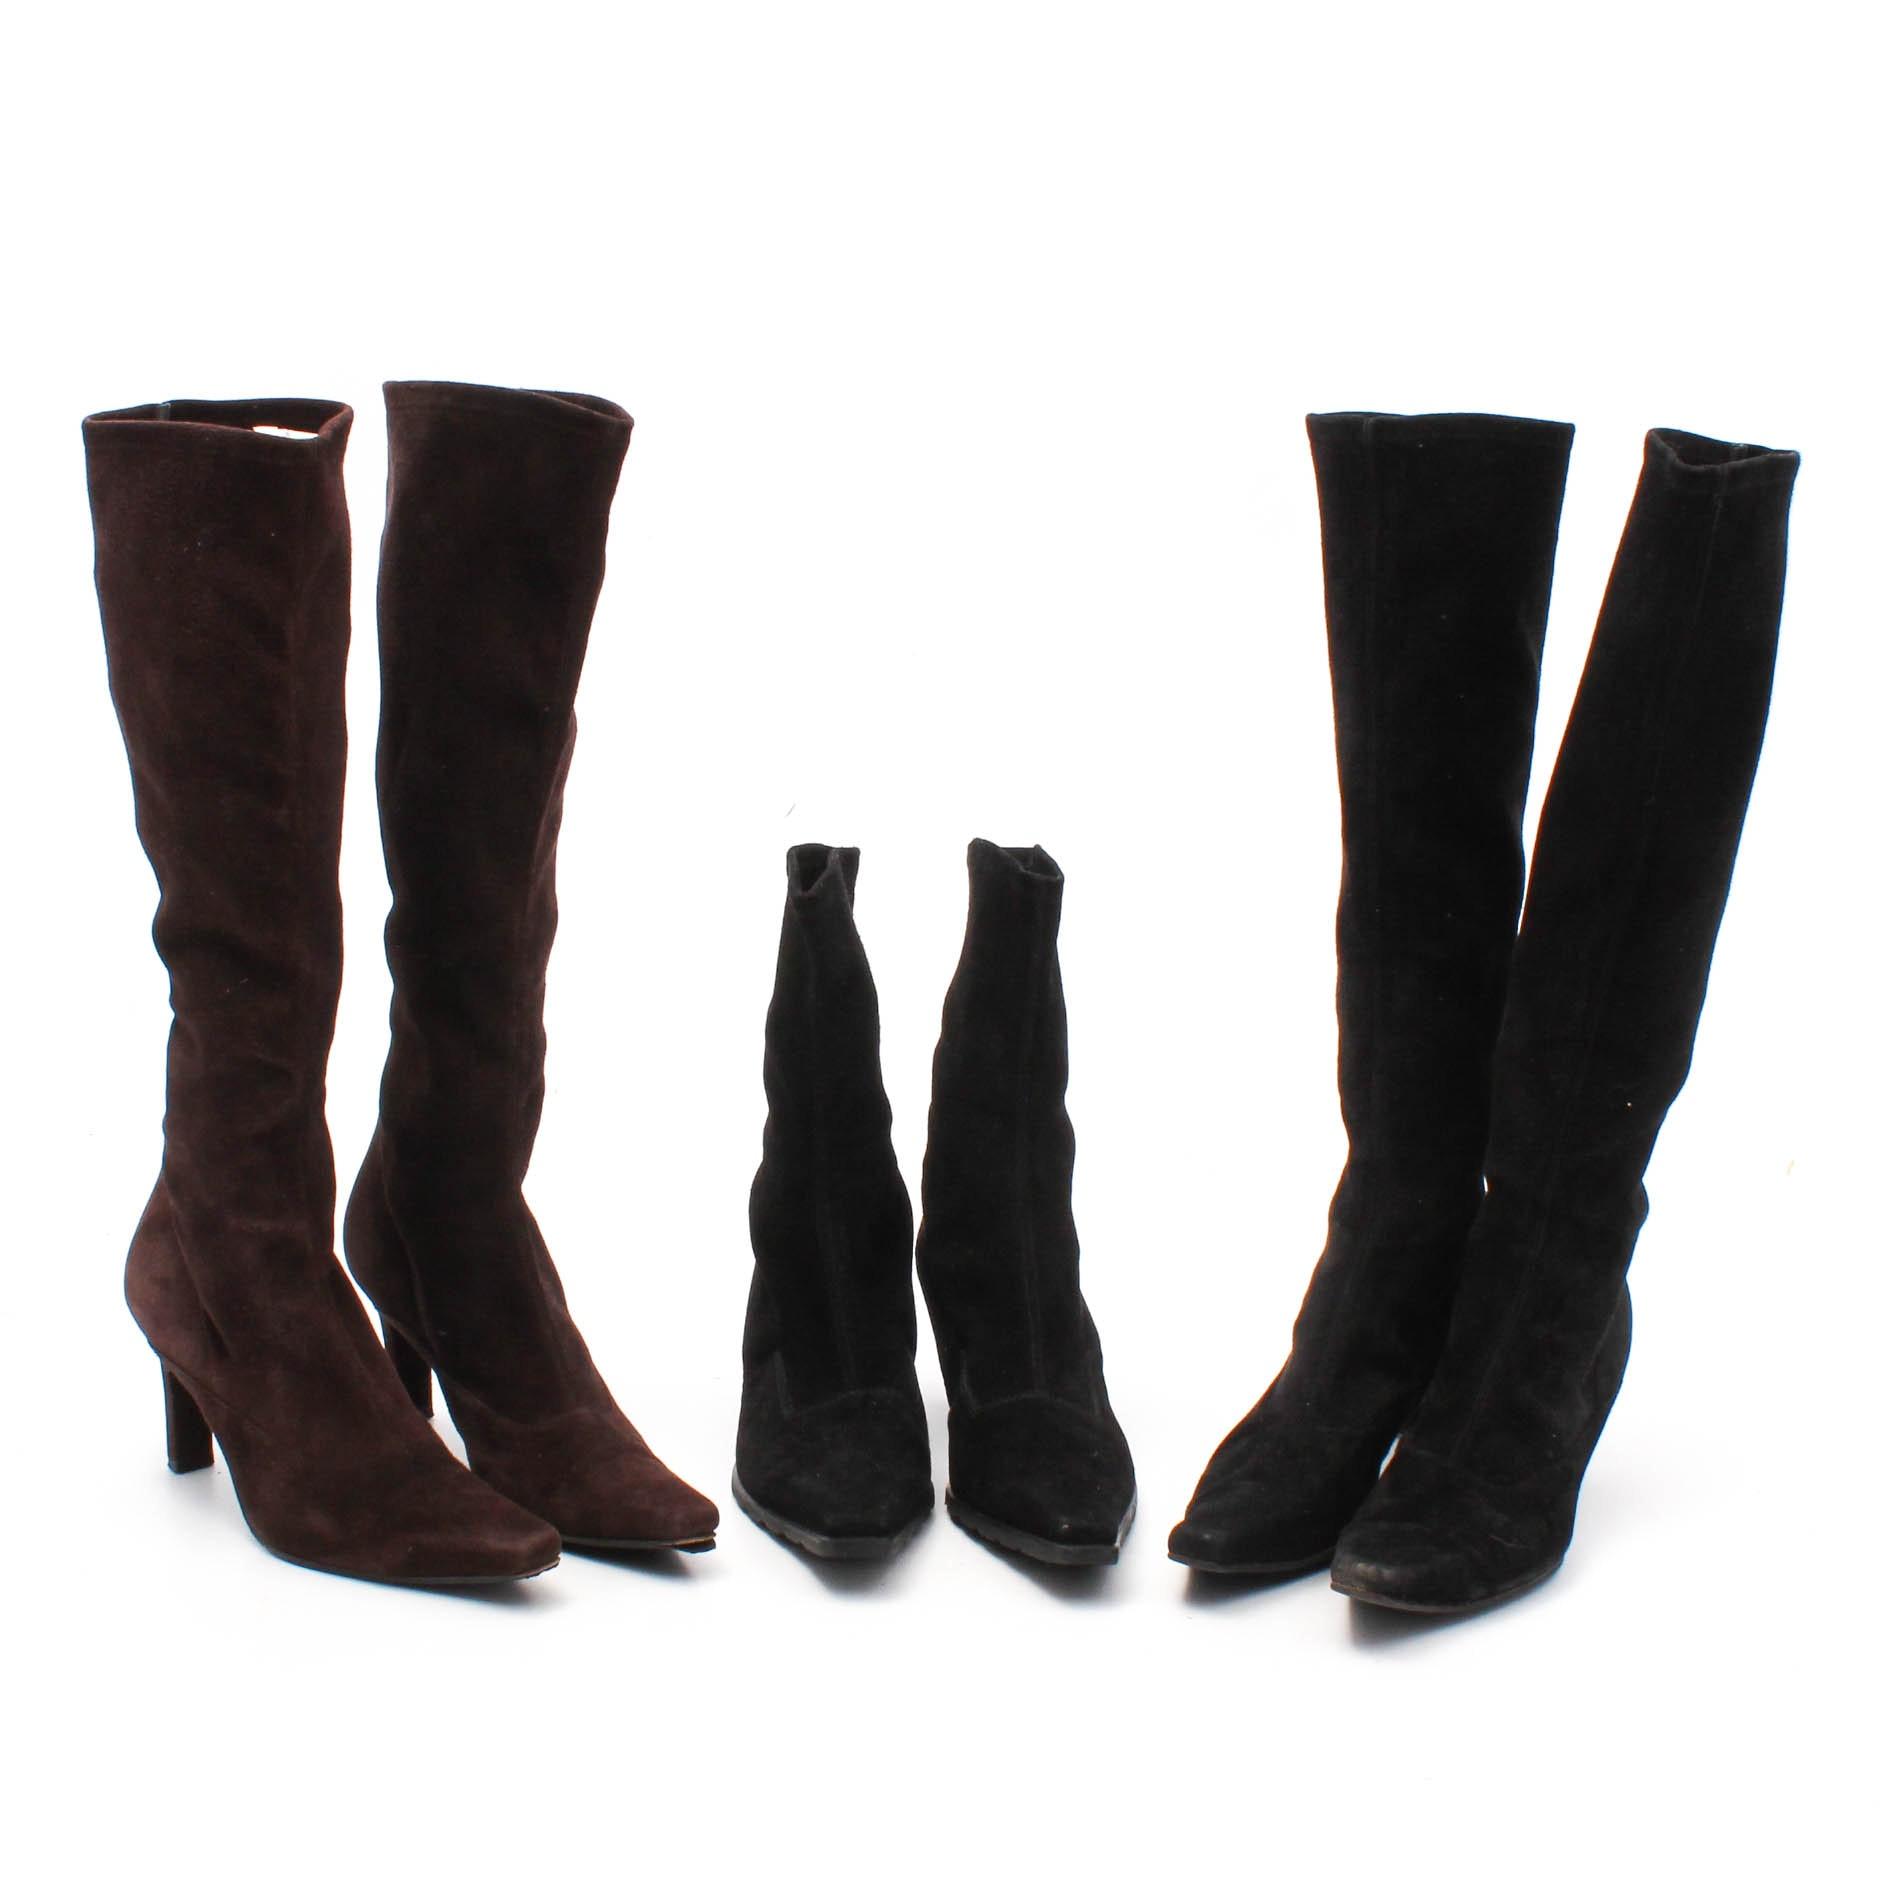 Three Pairs of Stuart Weitzman Suede Heeled Boots